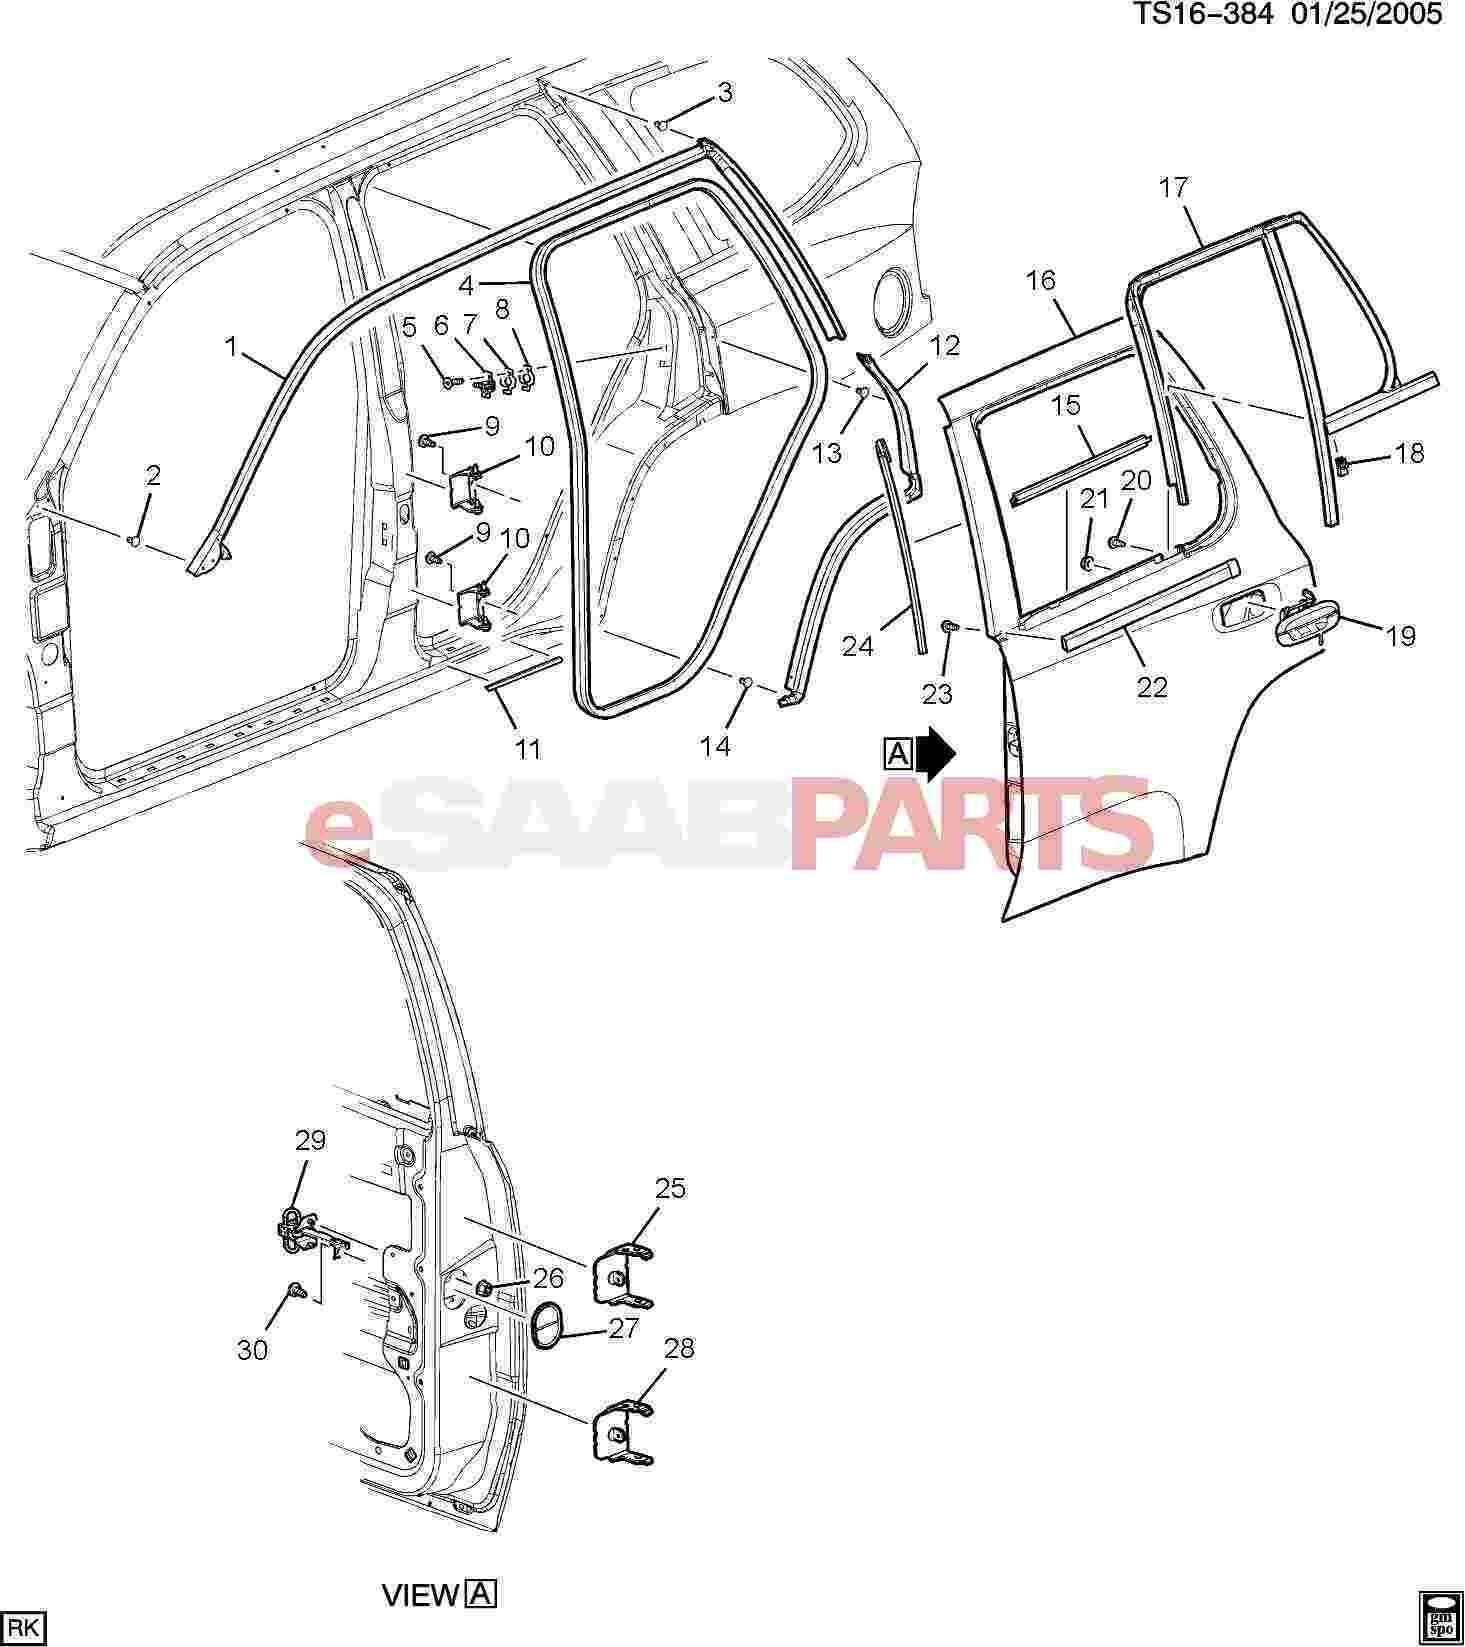 Car Body Panel Diagram Esaabparts Saab 9 7x Car Body Internal Parts Door Parts Of Car Body Panel Diagram